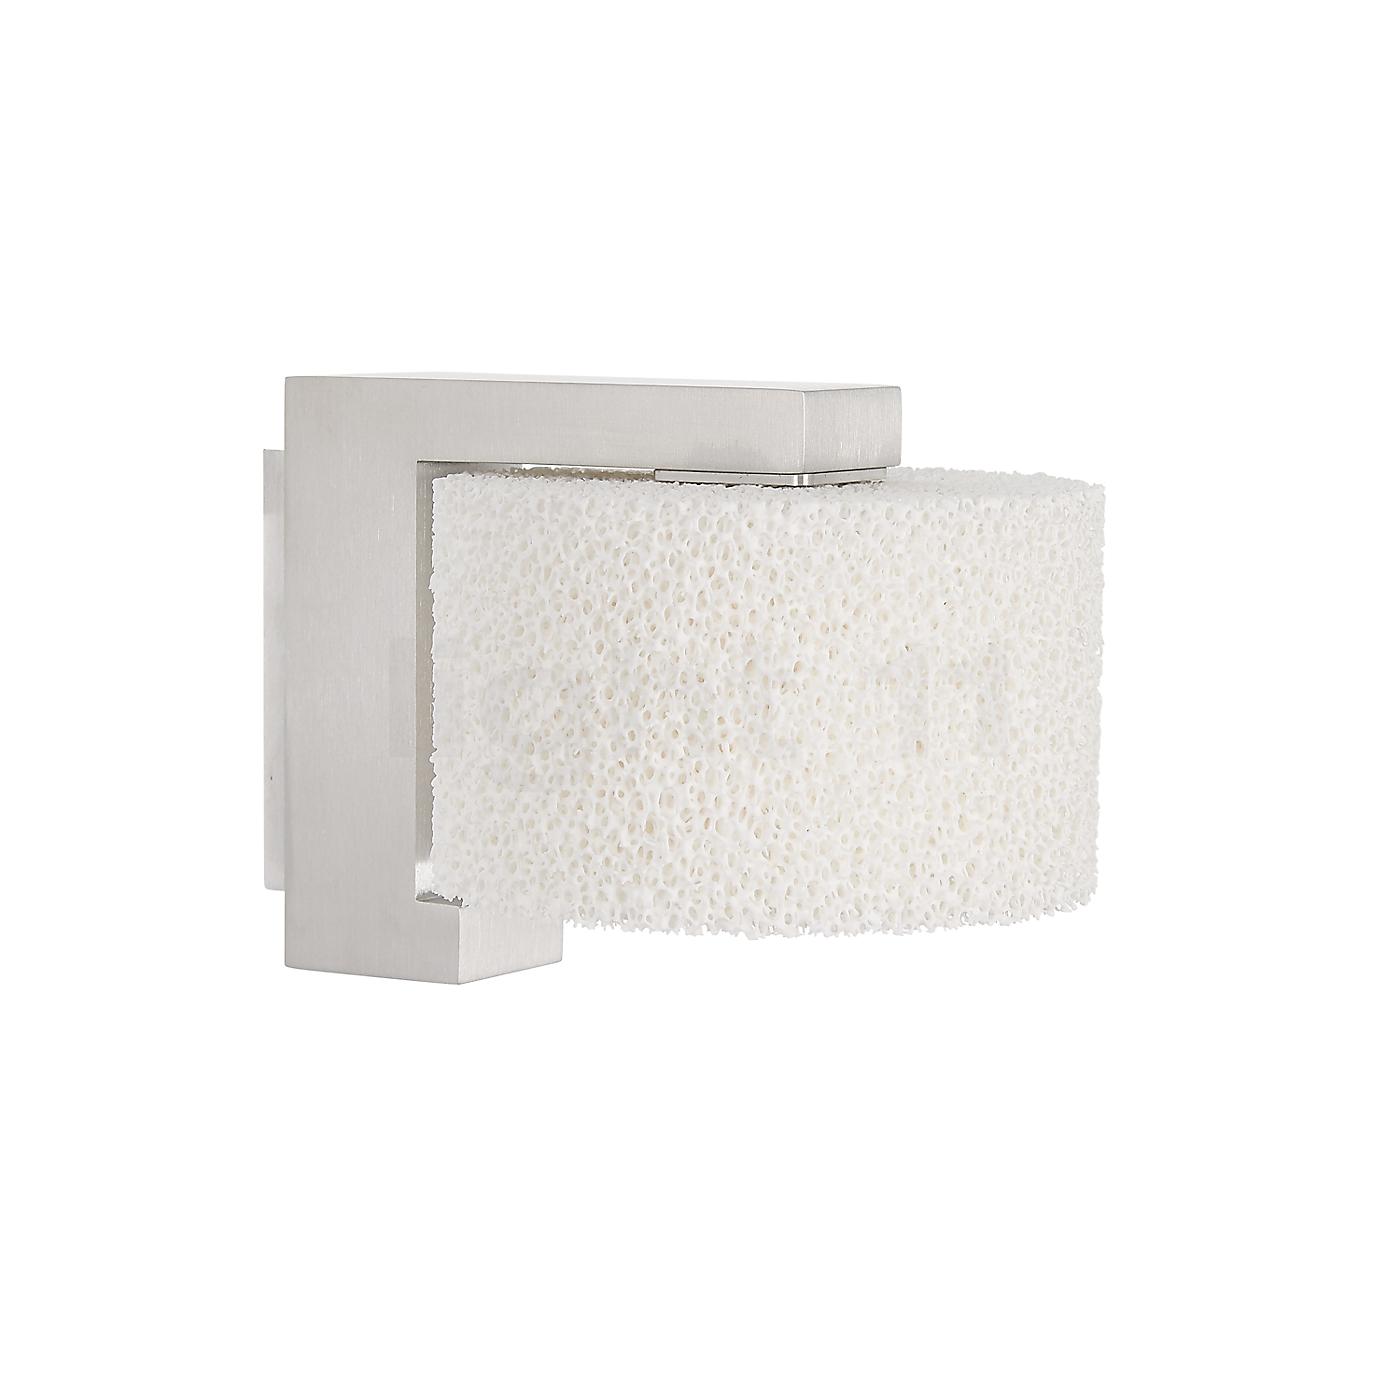 serien lighting reef wall led kaufen bei. Black Bedroom Furniture Sets. Home Design Ideas